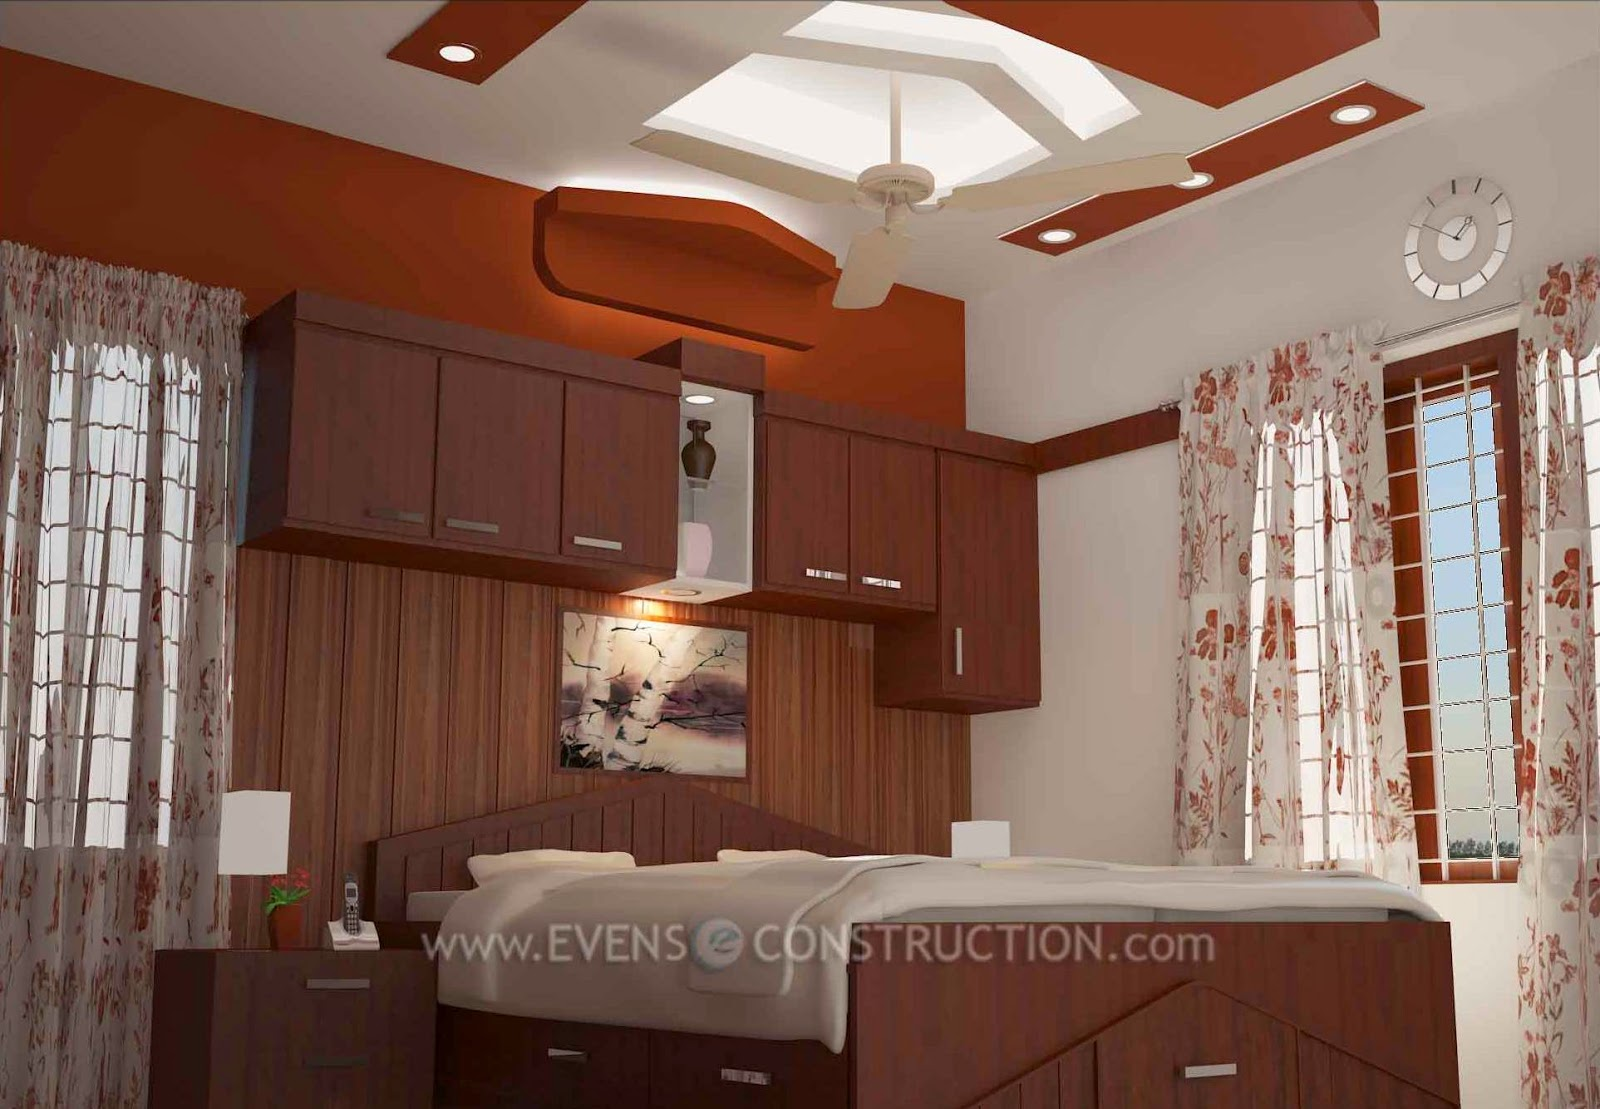 Evens Construction Pvt Ltd Bedroom Interior Design For Kerala Home